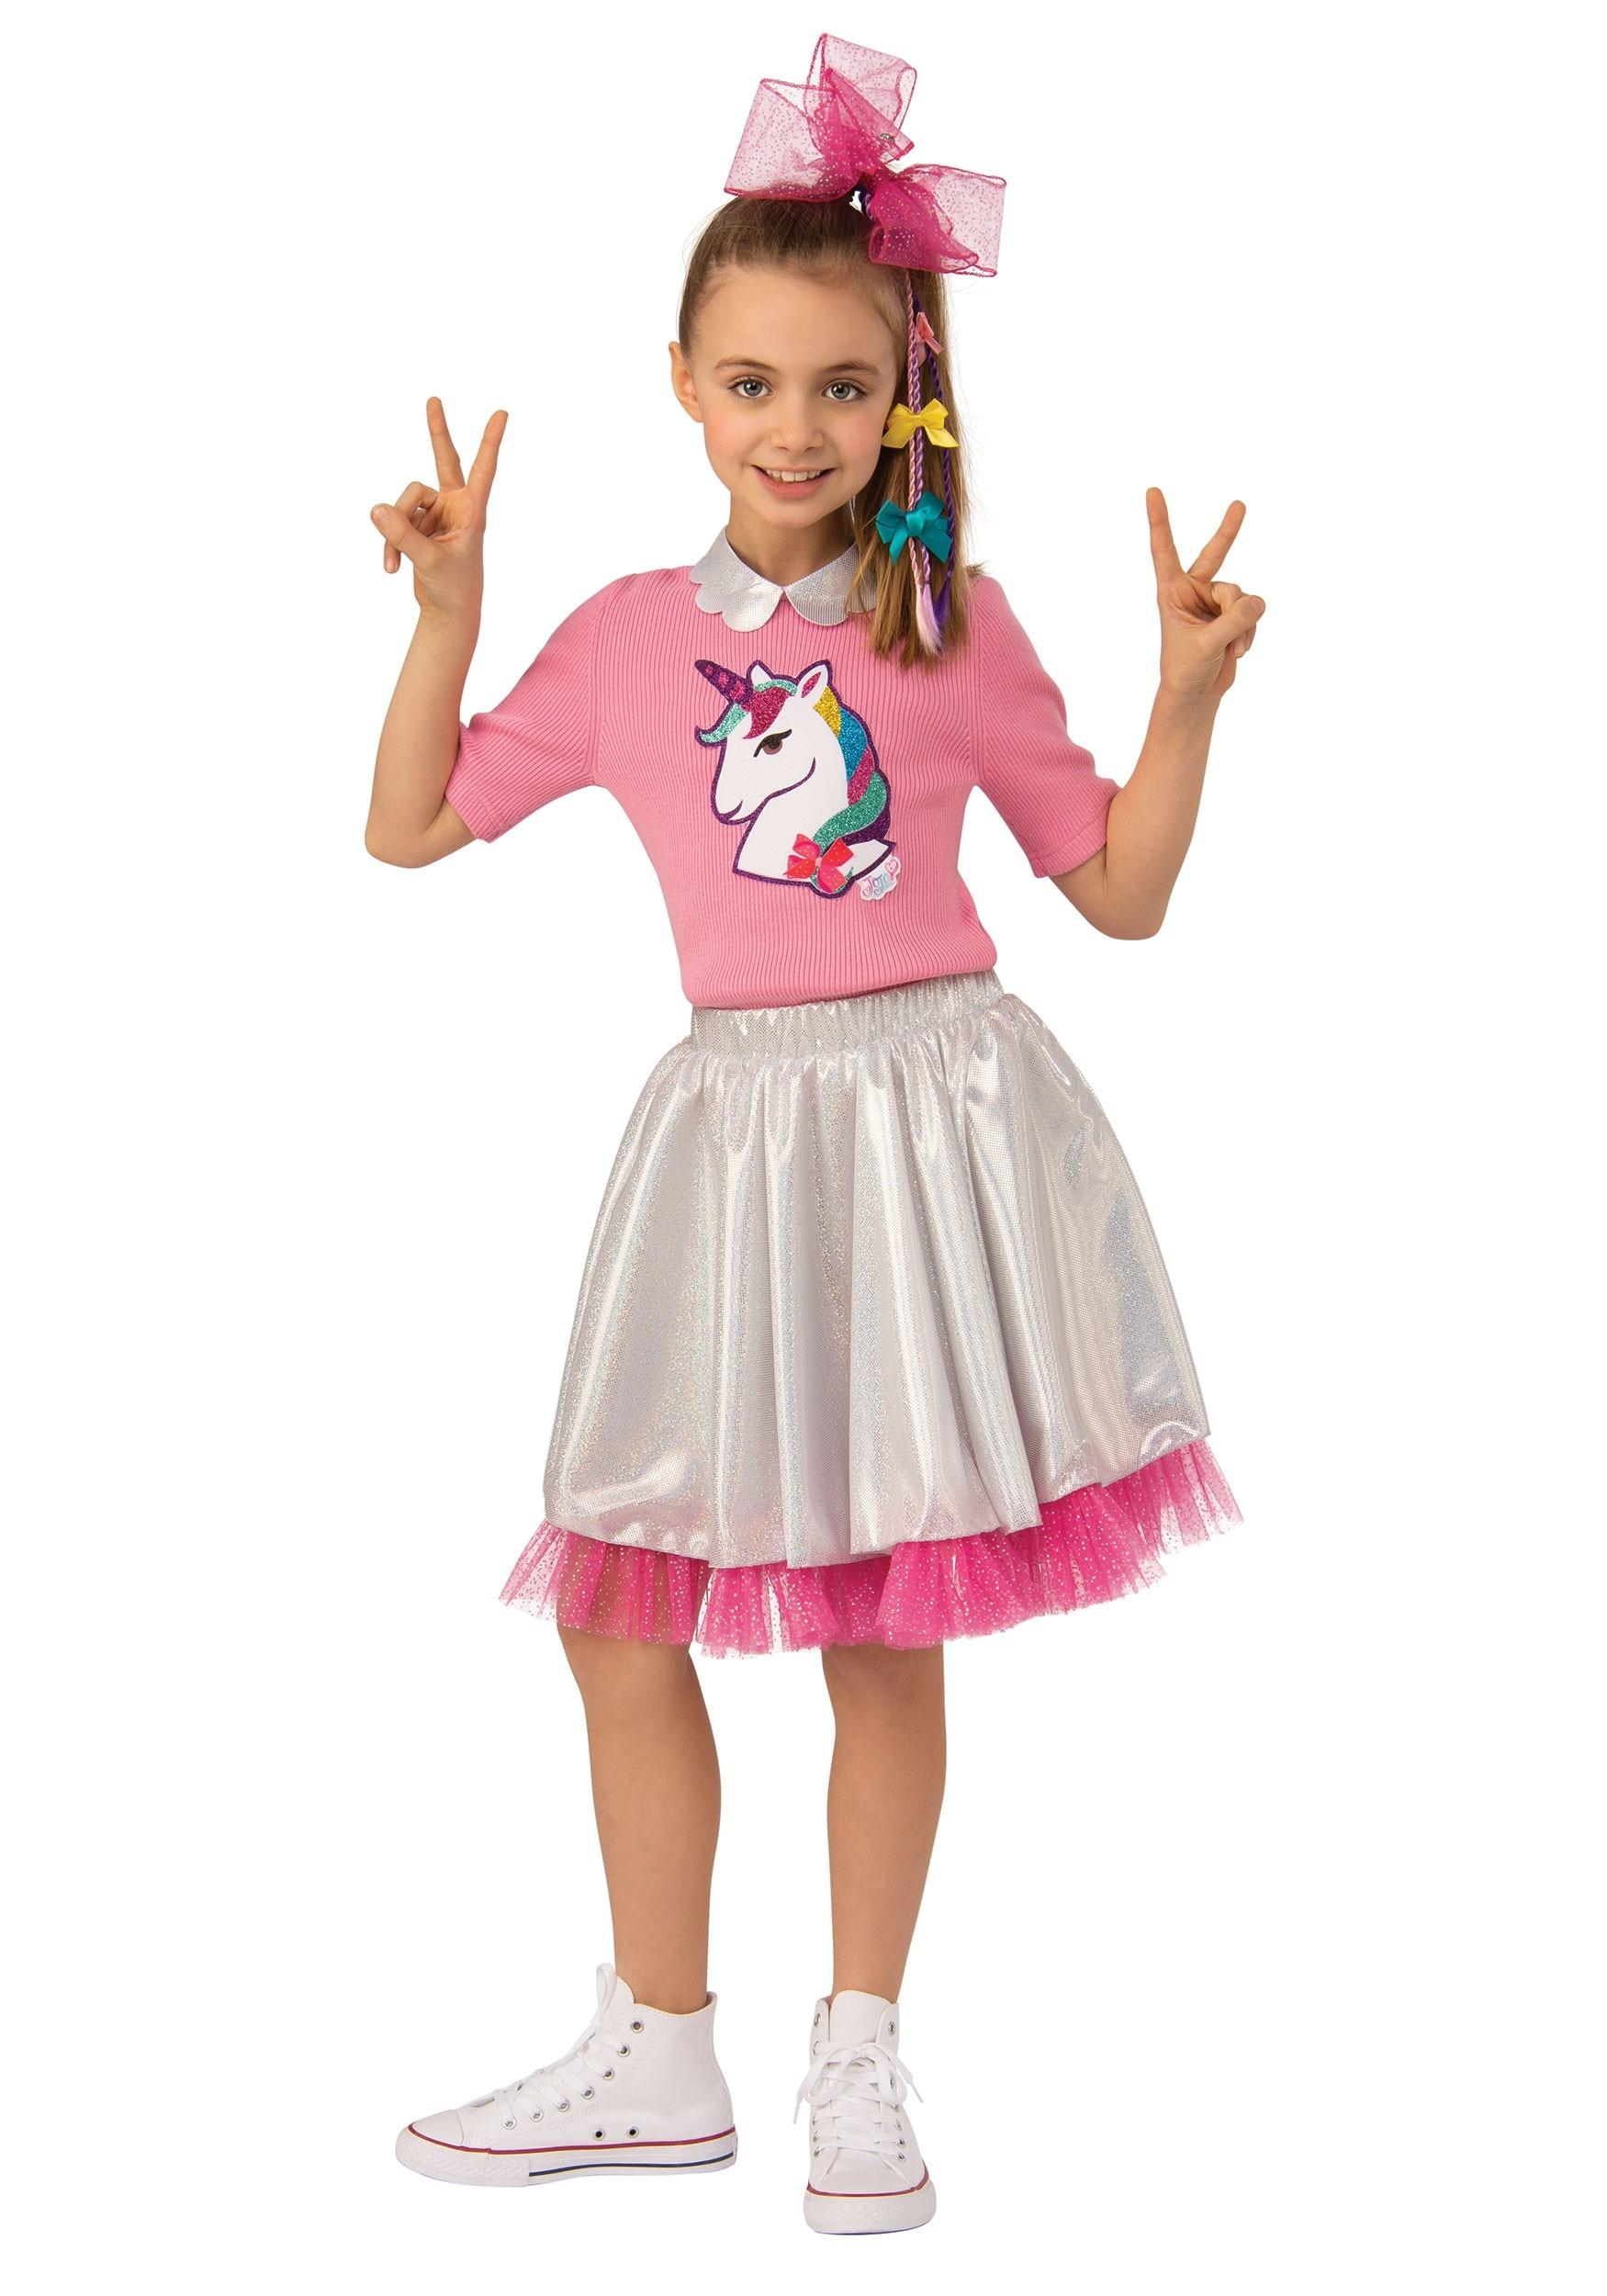 Kid in Candy Store JoJo Siwa Costume